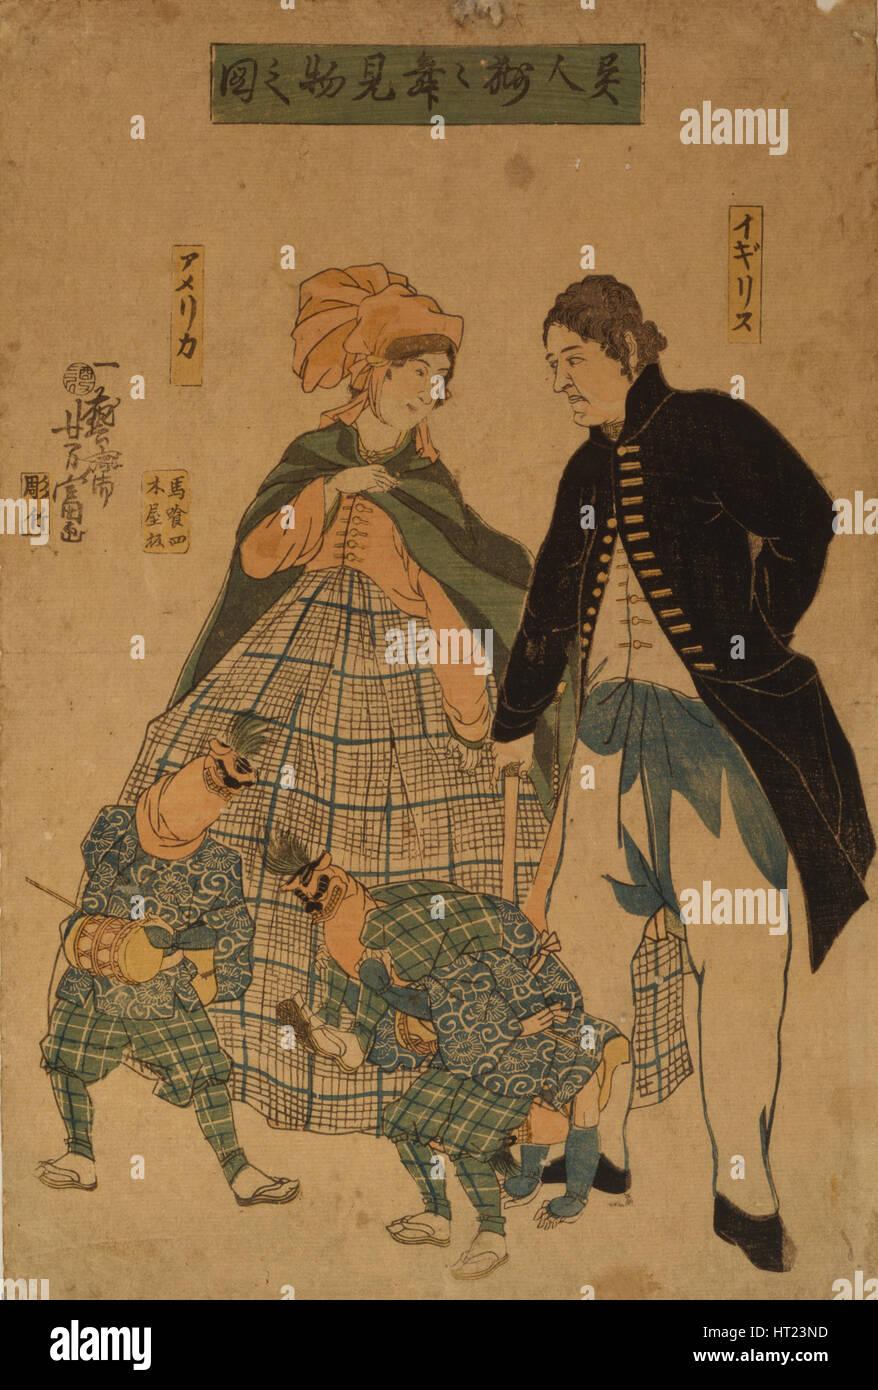 Foreigners watching New Year's dance, 1861. Artist: Utagawa, Yoshitomi (active 1850-1870) - Stock Image